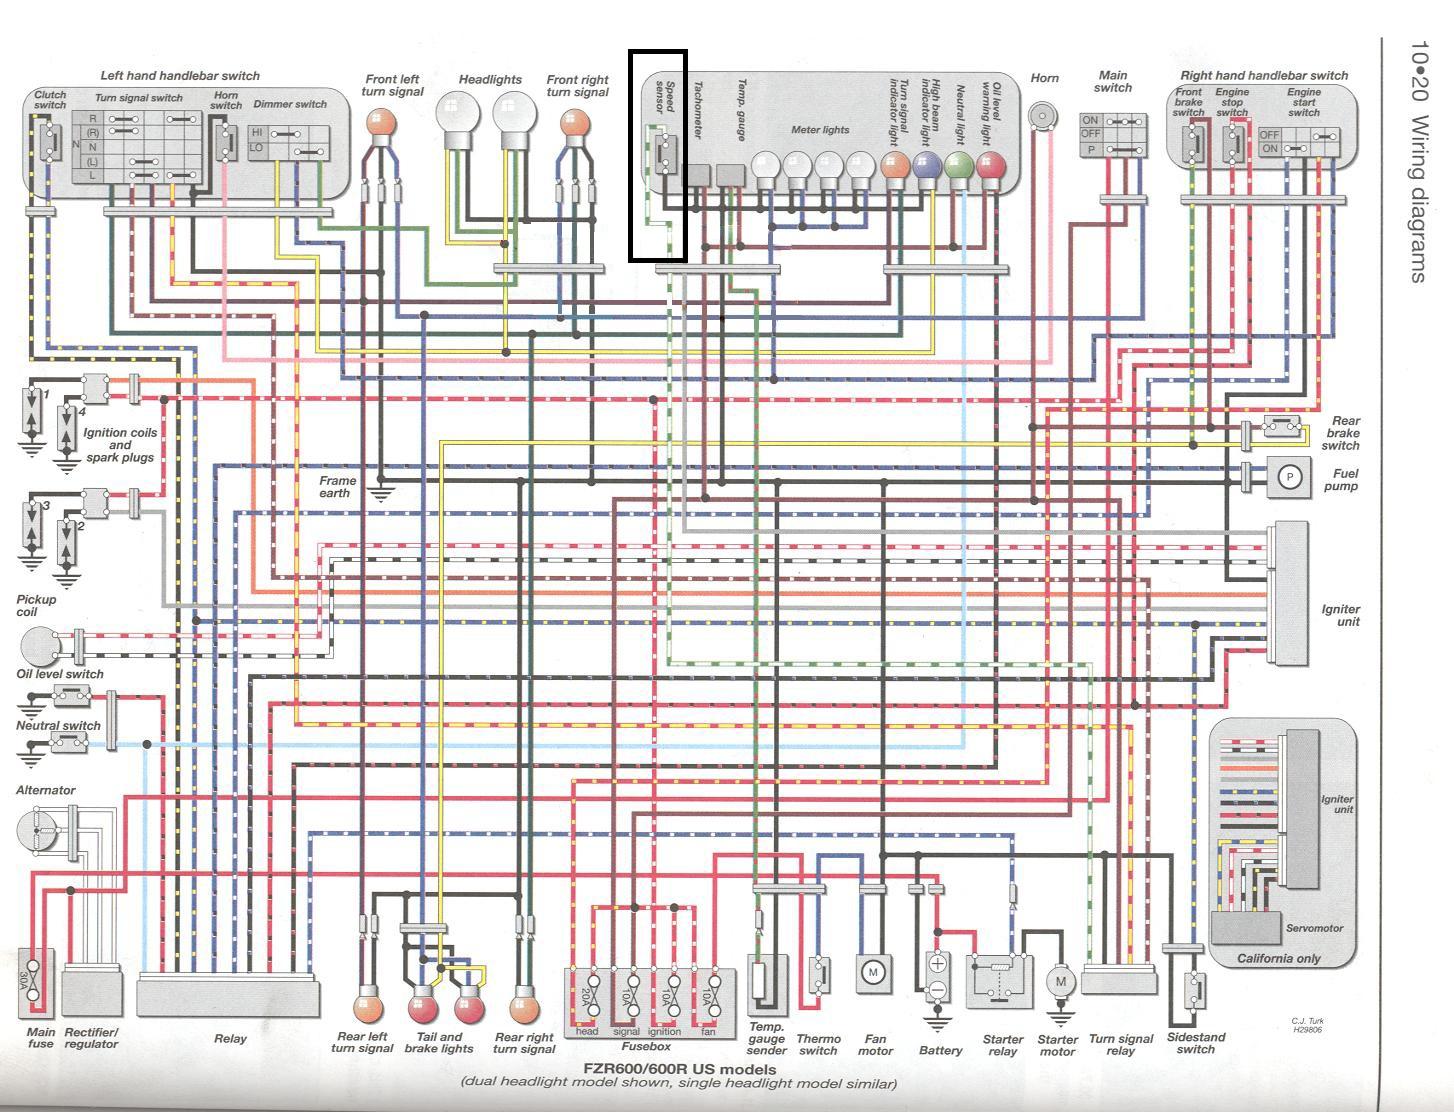 Panasonic Cq5109u Wiring Harness 32 Diagram Images Cq Cp134u Diagrams Fzr600resize